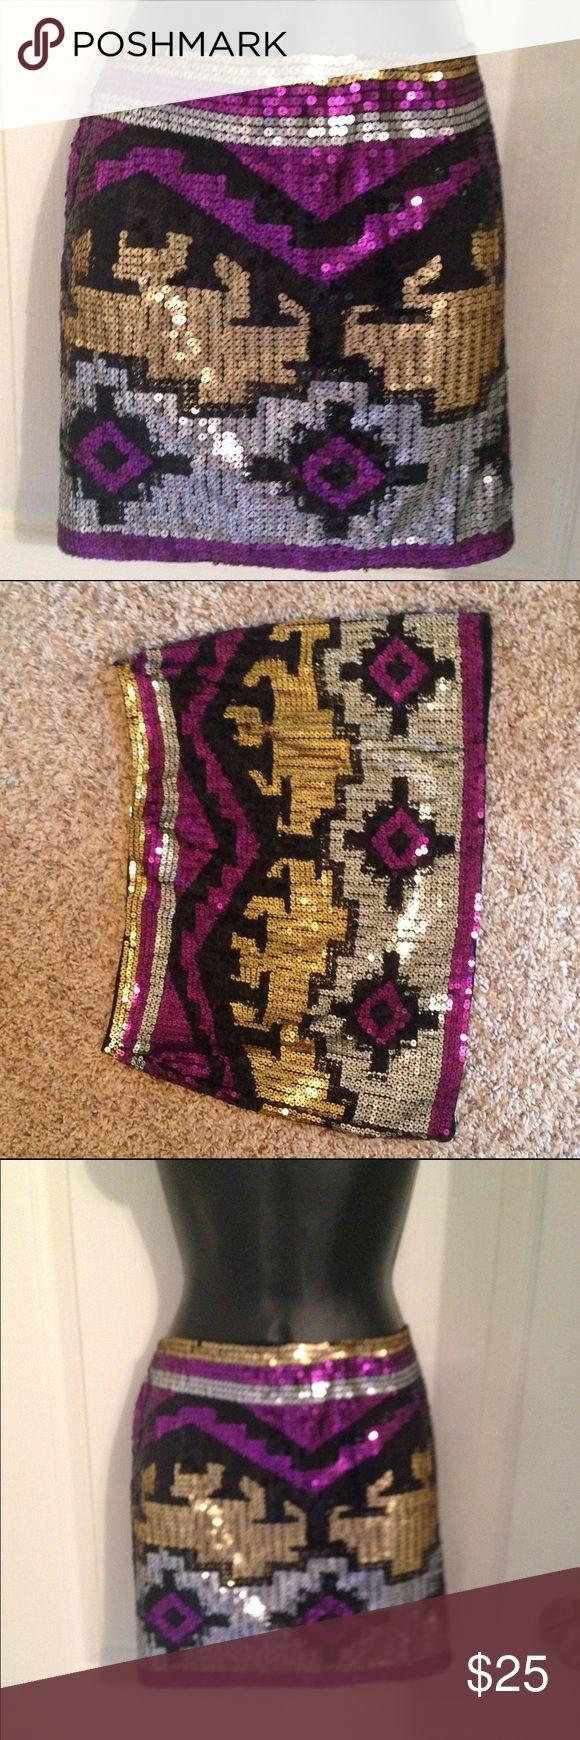 Purple & gold Aztec sequin skirt Purple & gold Aztec / tribal sequin mini skirt, sz large envy me Skirts Mini